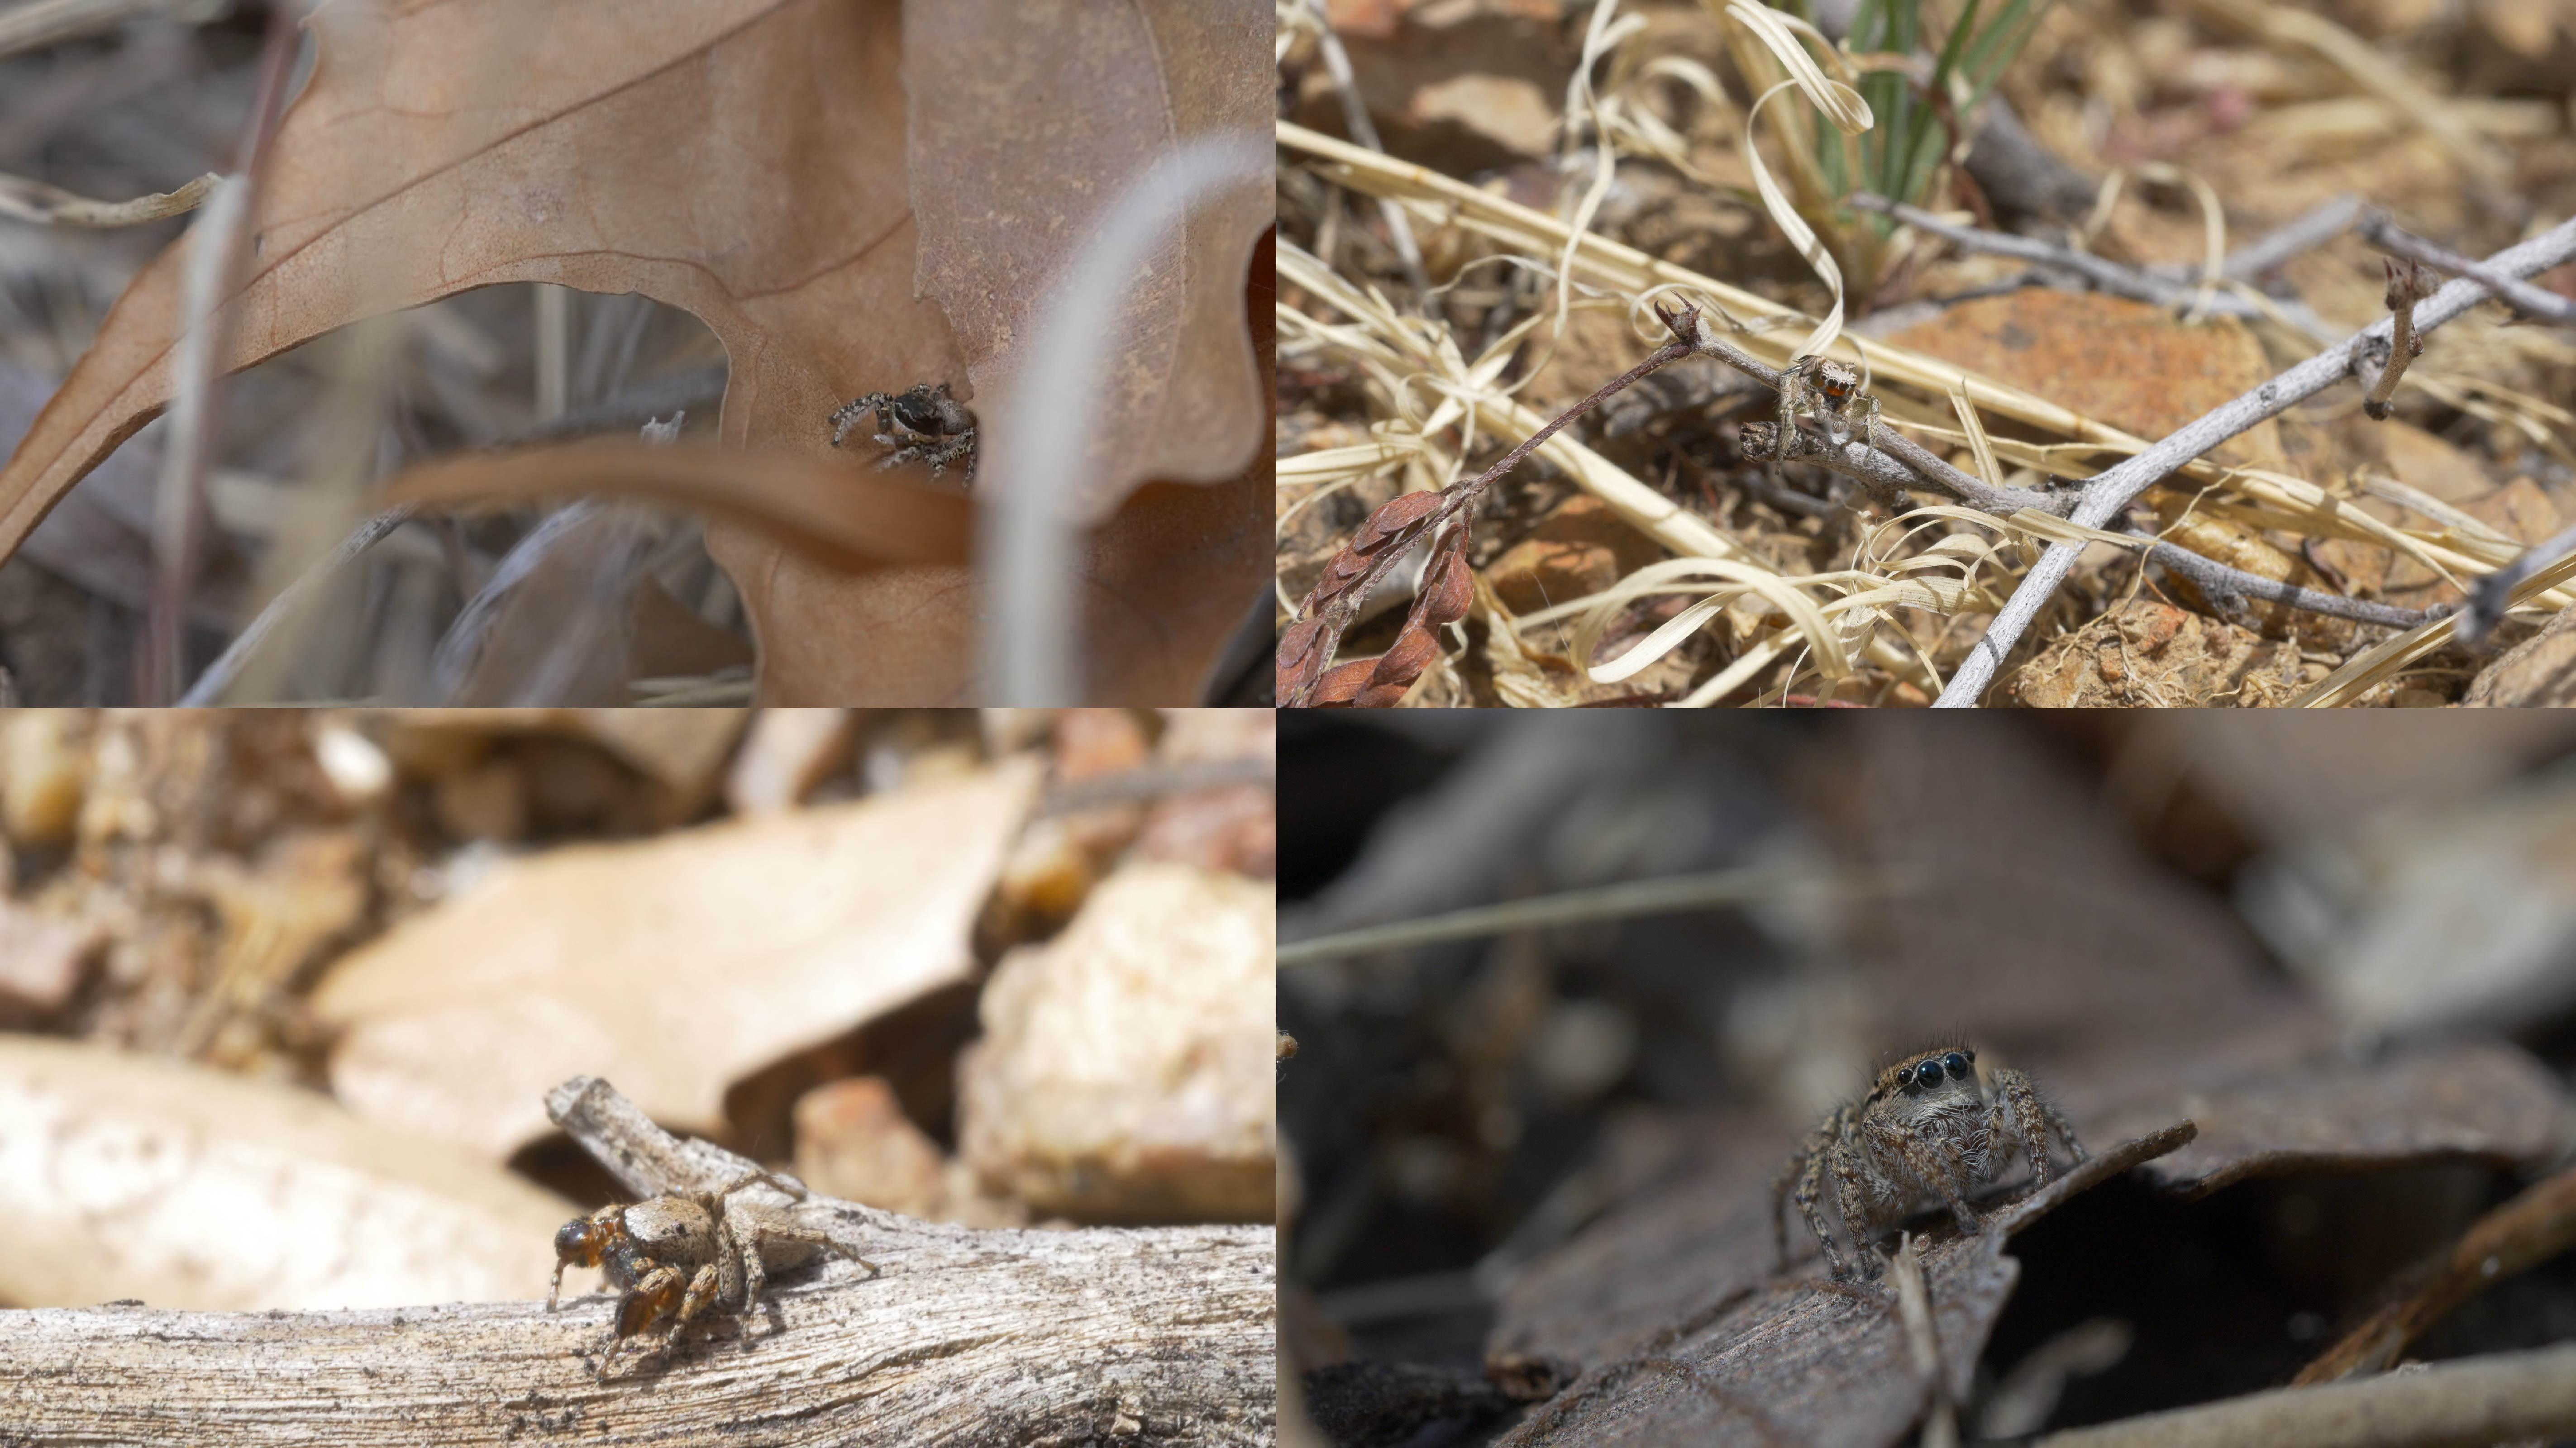 Collage of Habronattus spiders in their habitats